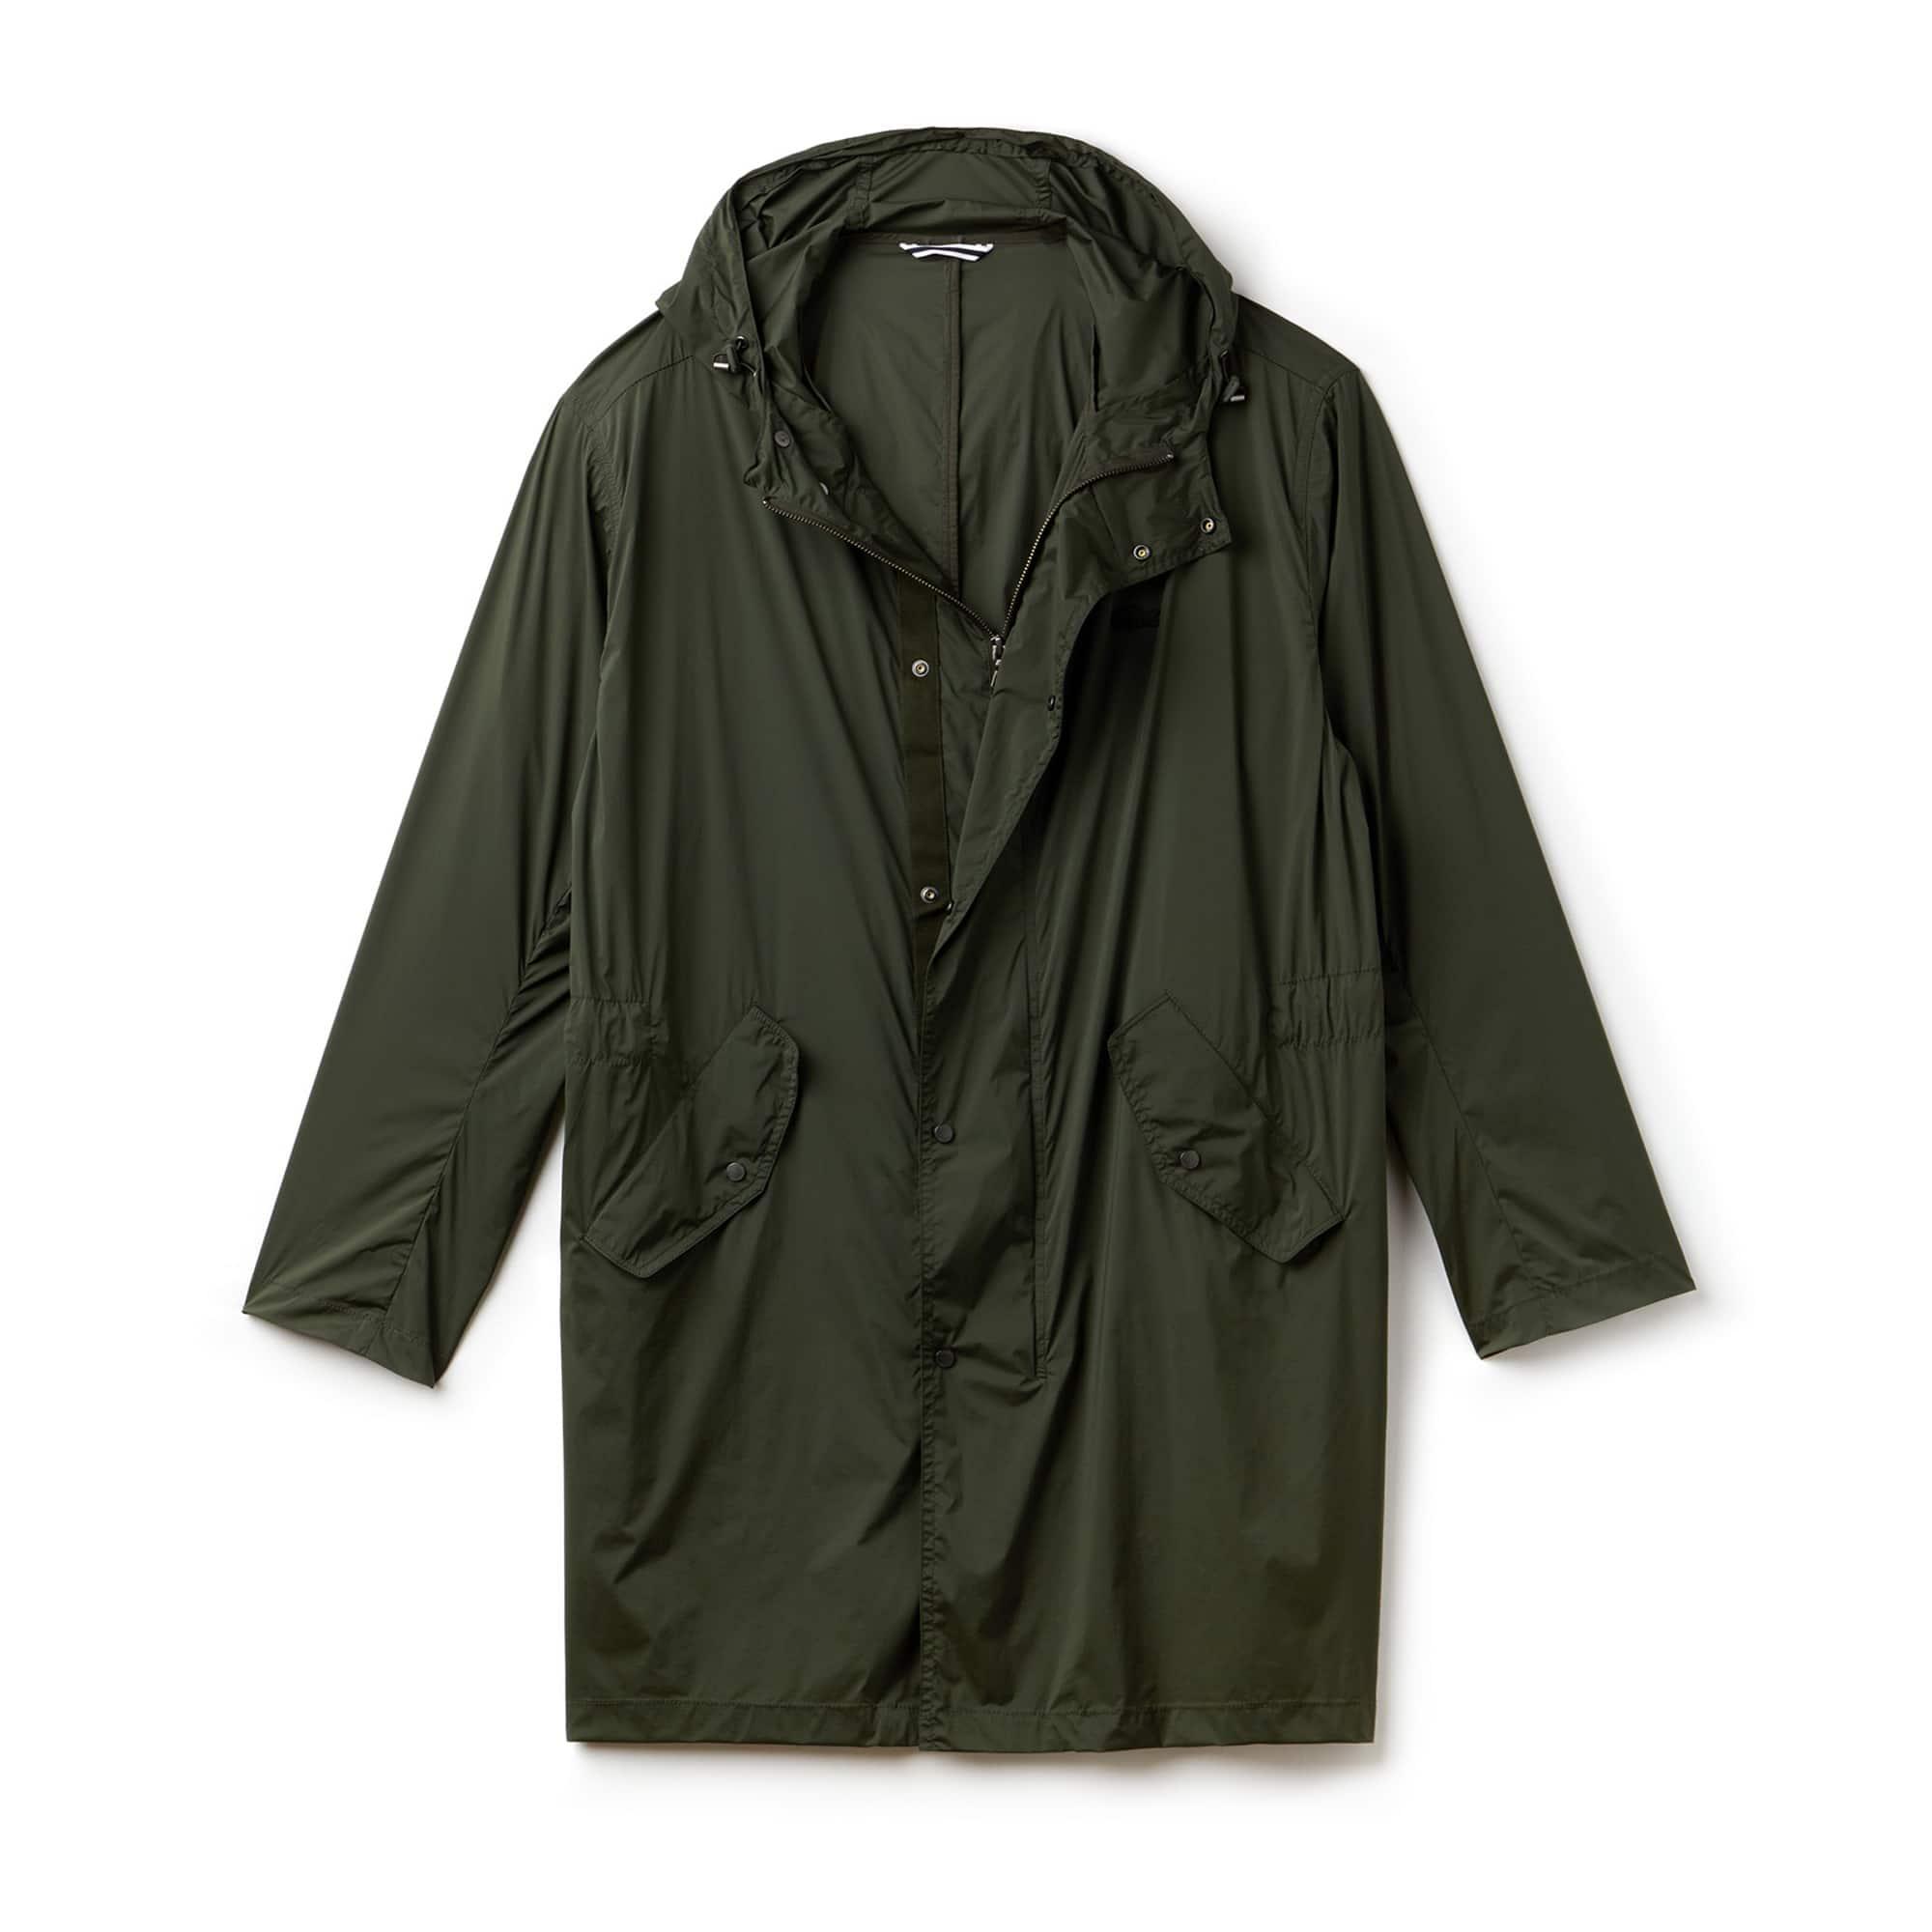 Lacoste MOTION男士单色弹力塔夫绸长版连帽防风夹克